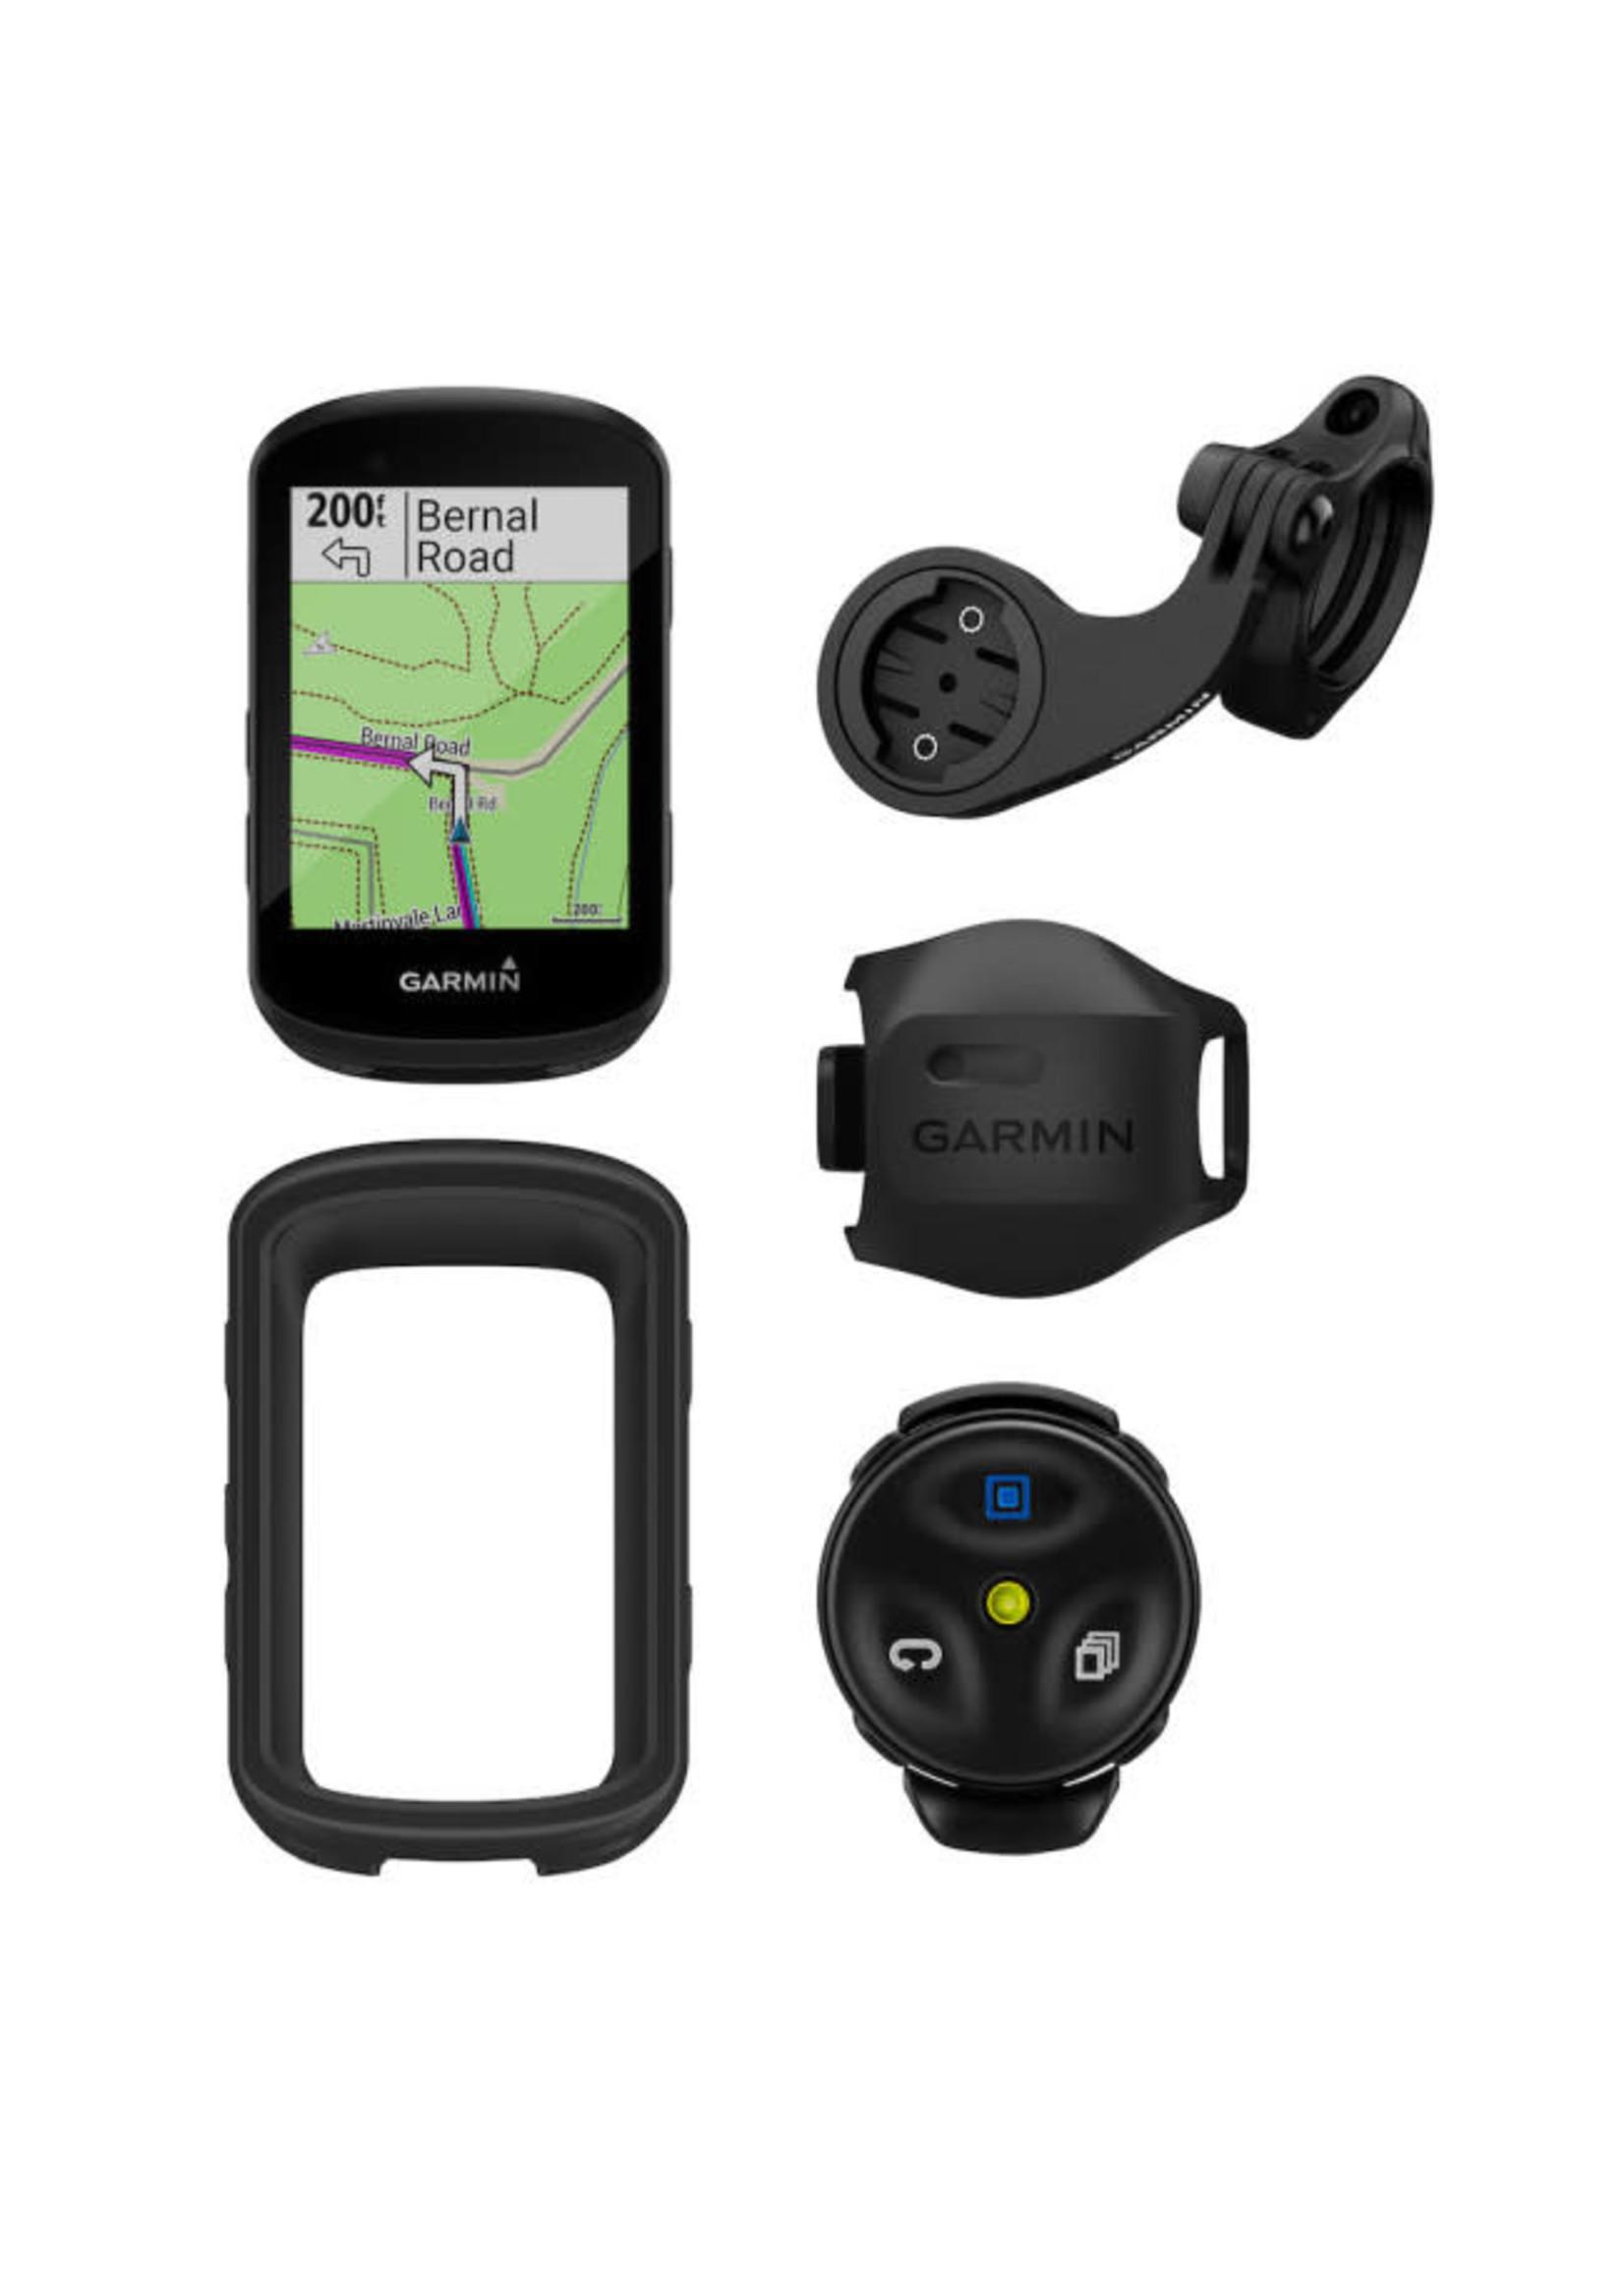 Garmin Garmin, Edge 530 MTN Bundle, Computer, GPS: Yes, HR: Optional, Cadence: Optional, Black, 010-02060-20